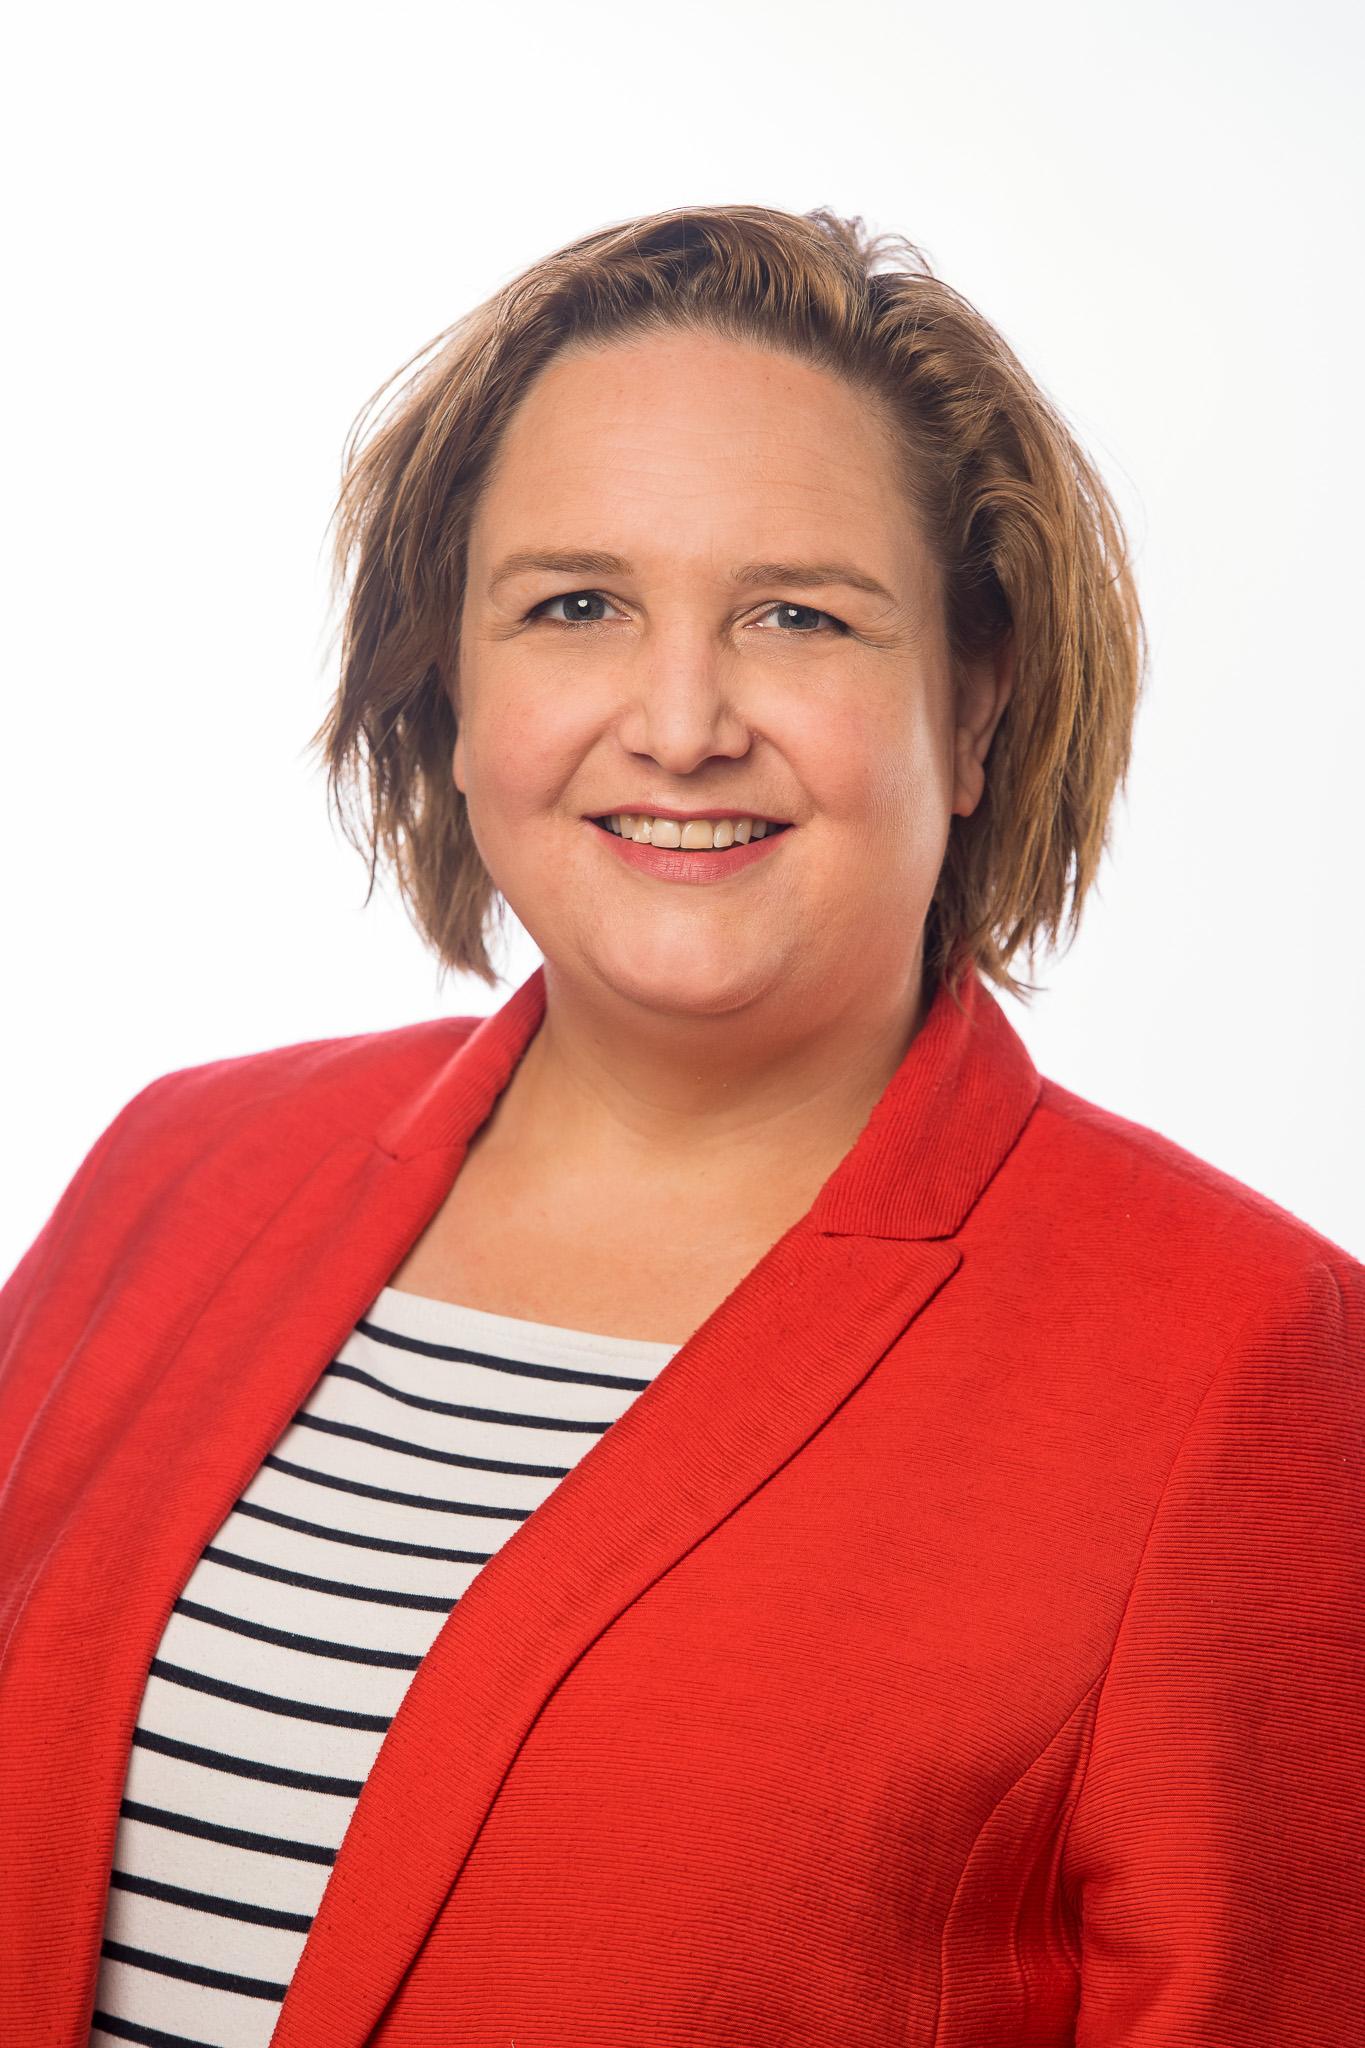 Portretfoto van medewerker Hanneke Verrijt